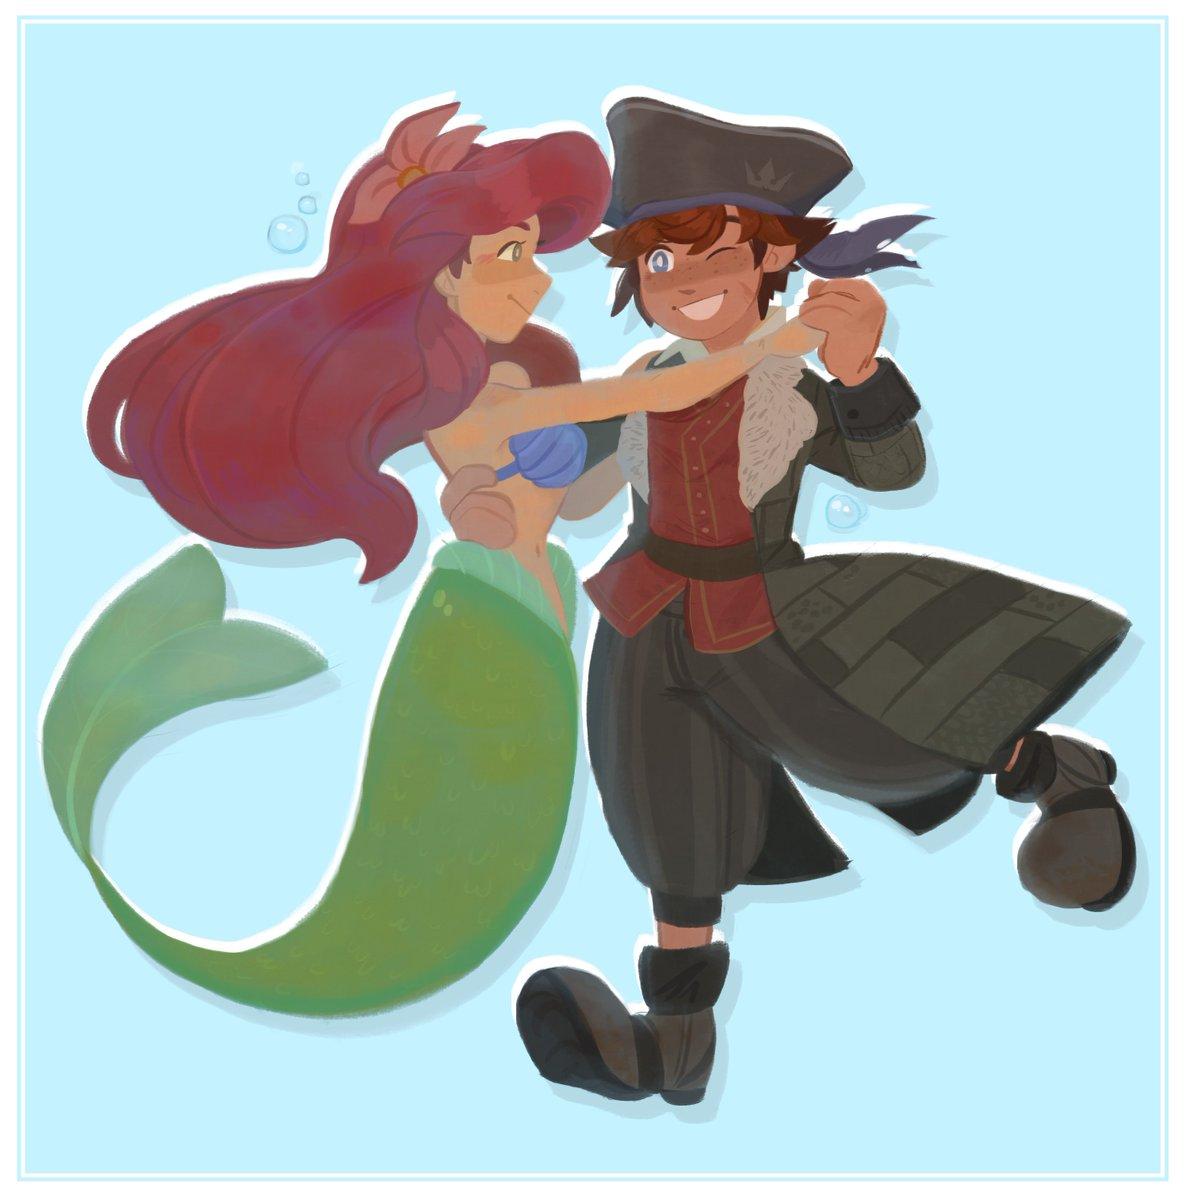 Sharing the finished Sora Ariel design for #mermay ;0   #kh  #kh3<br>http://pic.twitter.com/9cfUR8SKKF